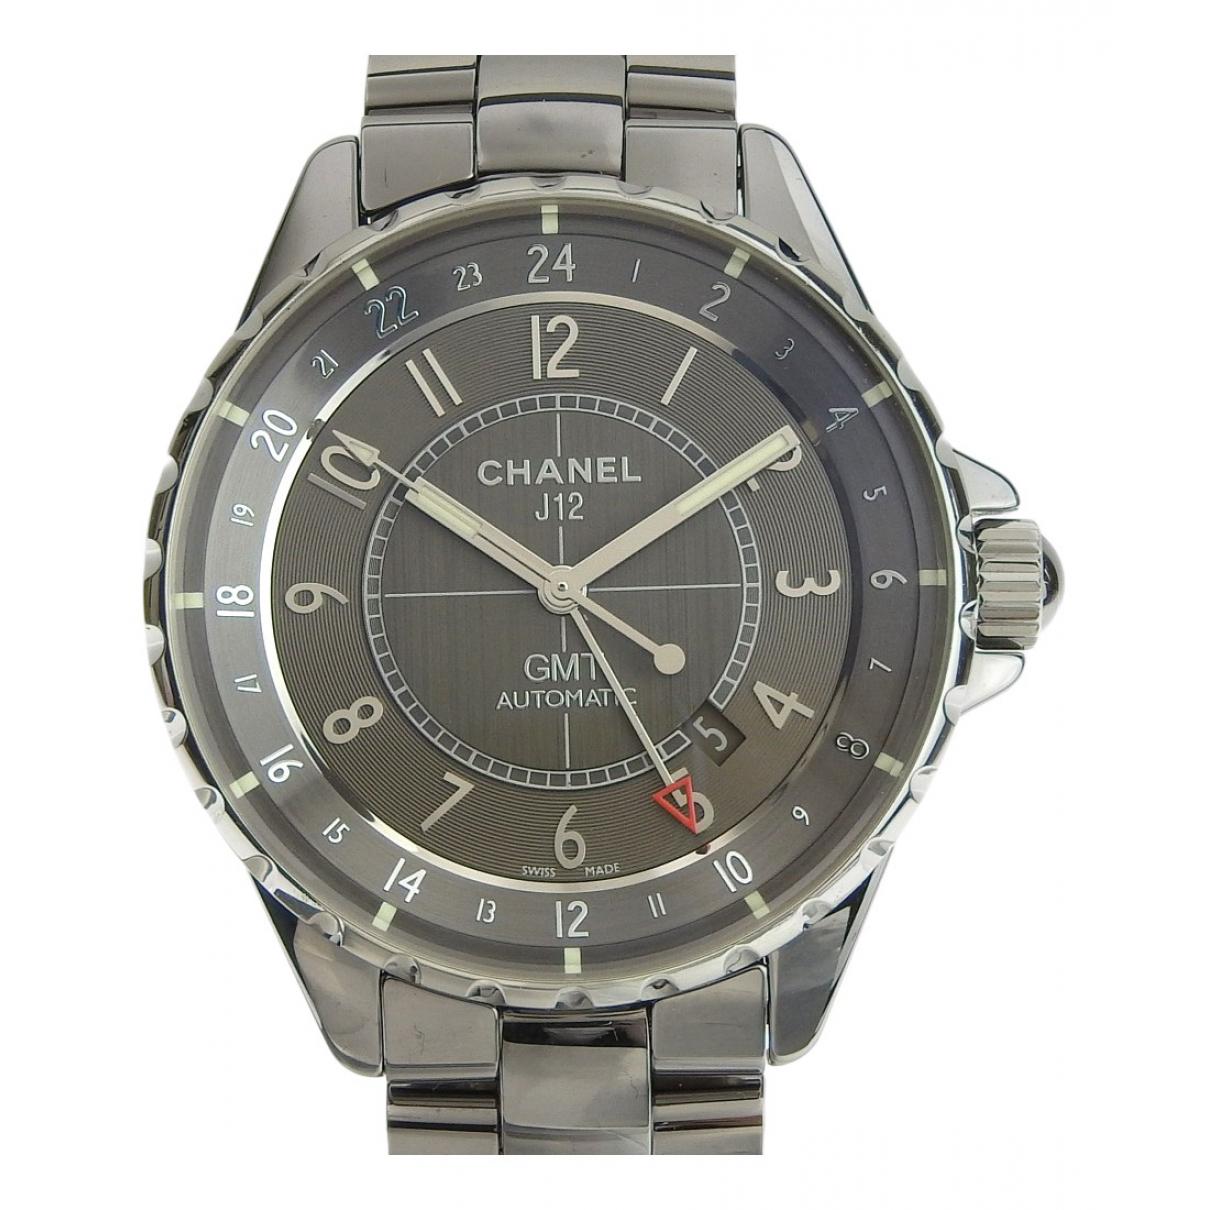 Relojes J12 Automatique de Ceramica Chanel